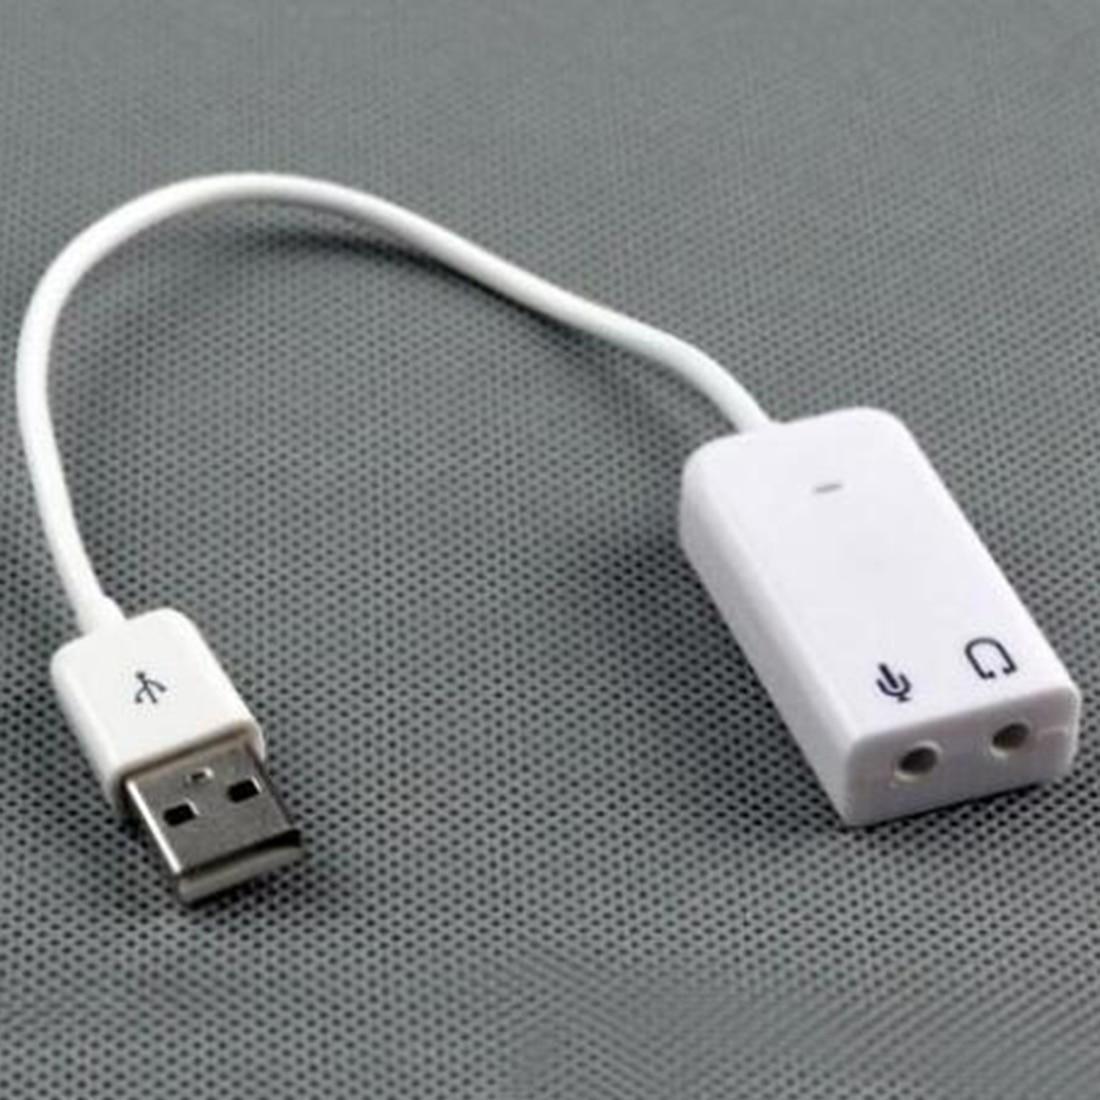 New Sienoc USB 2.0 Virtual 7.1 Channel Xear 3D External USB Sound Card Audio Adapter For Windows XP Win 7 8 Linux Vista Mac OS